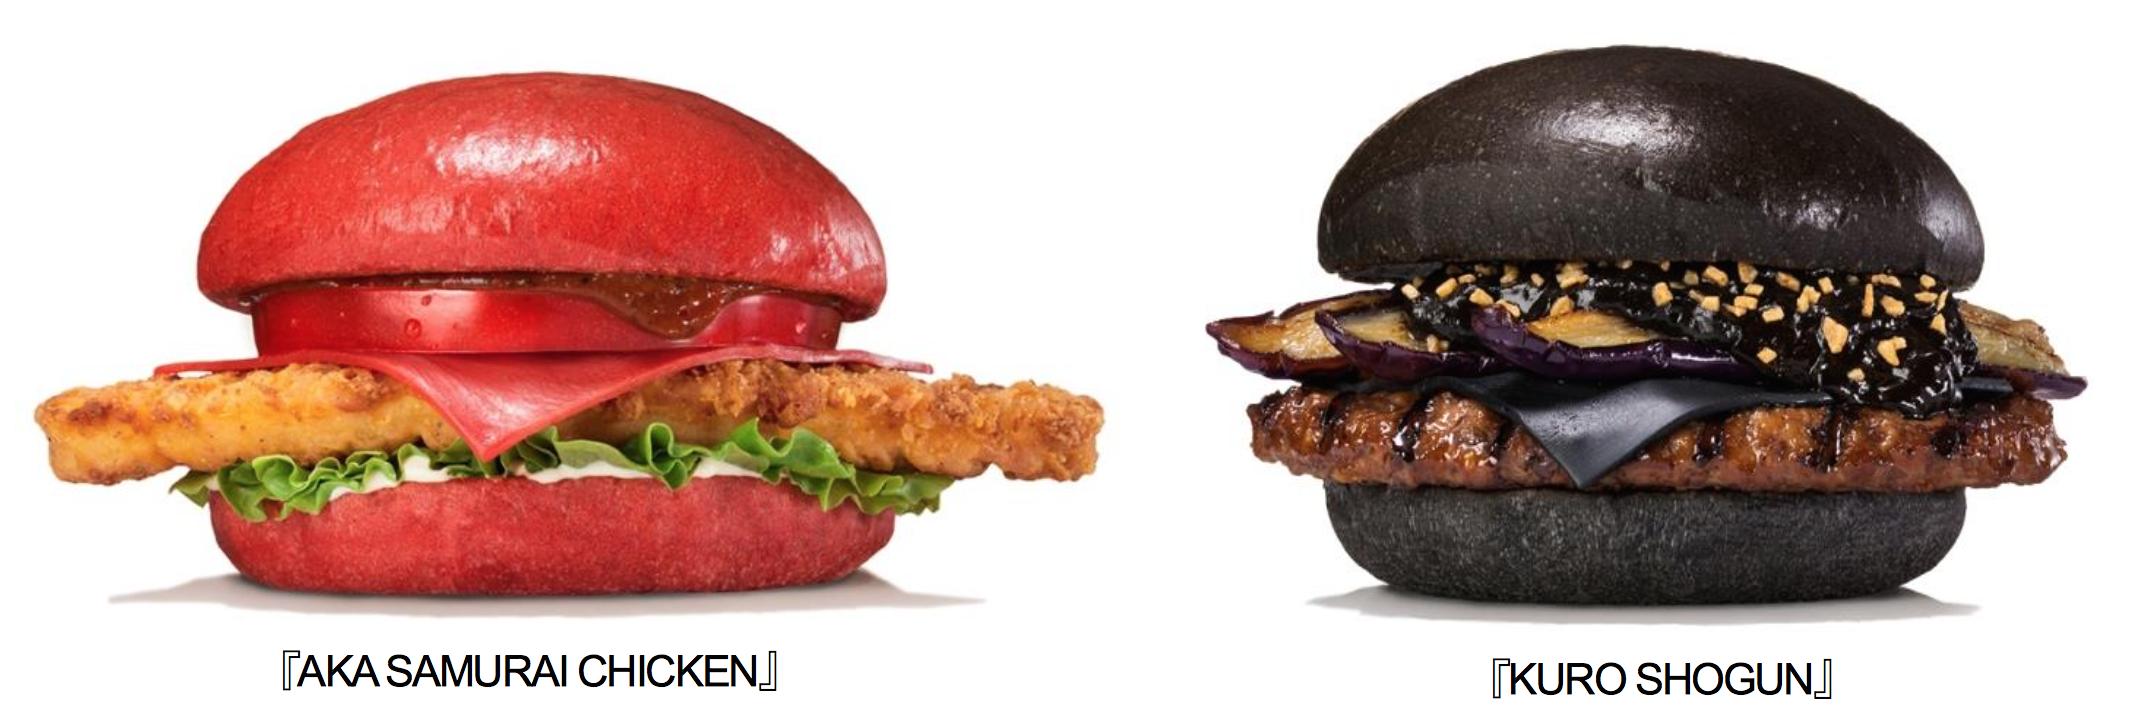 burger king red and black burger